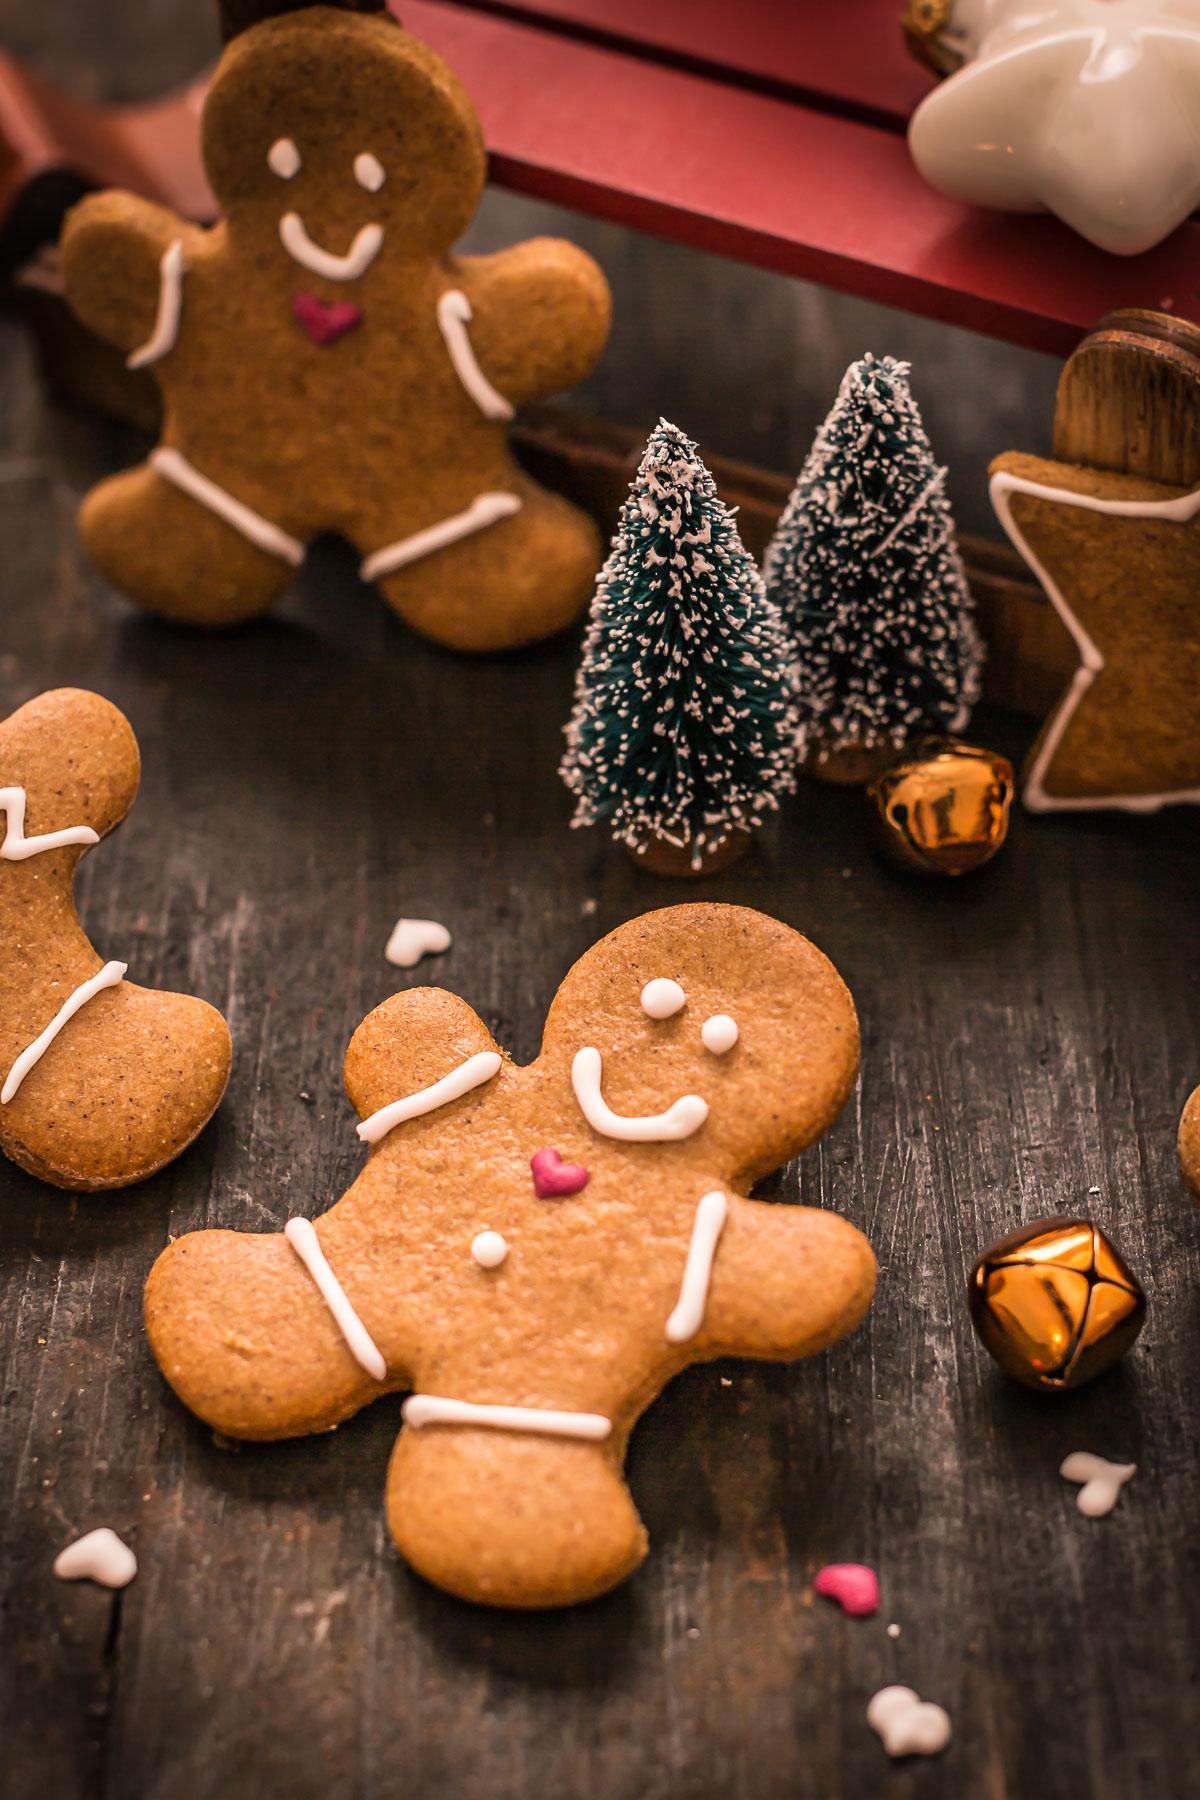 delicious vegan gingerbread man vegani - biscotti pan di zenzero vegani croccanti leggeri e friabili #vegan gingerbread man